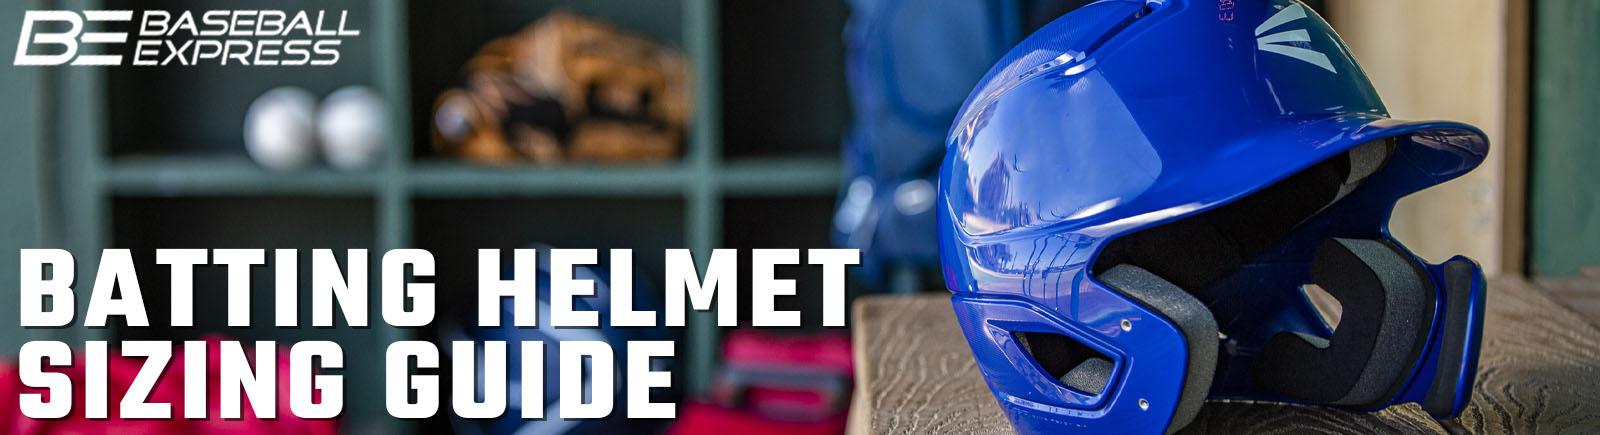 Batting Helmet Sizing Guide